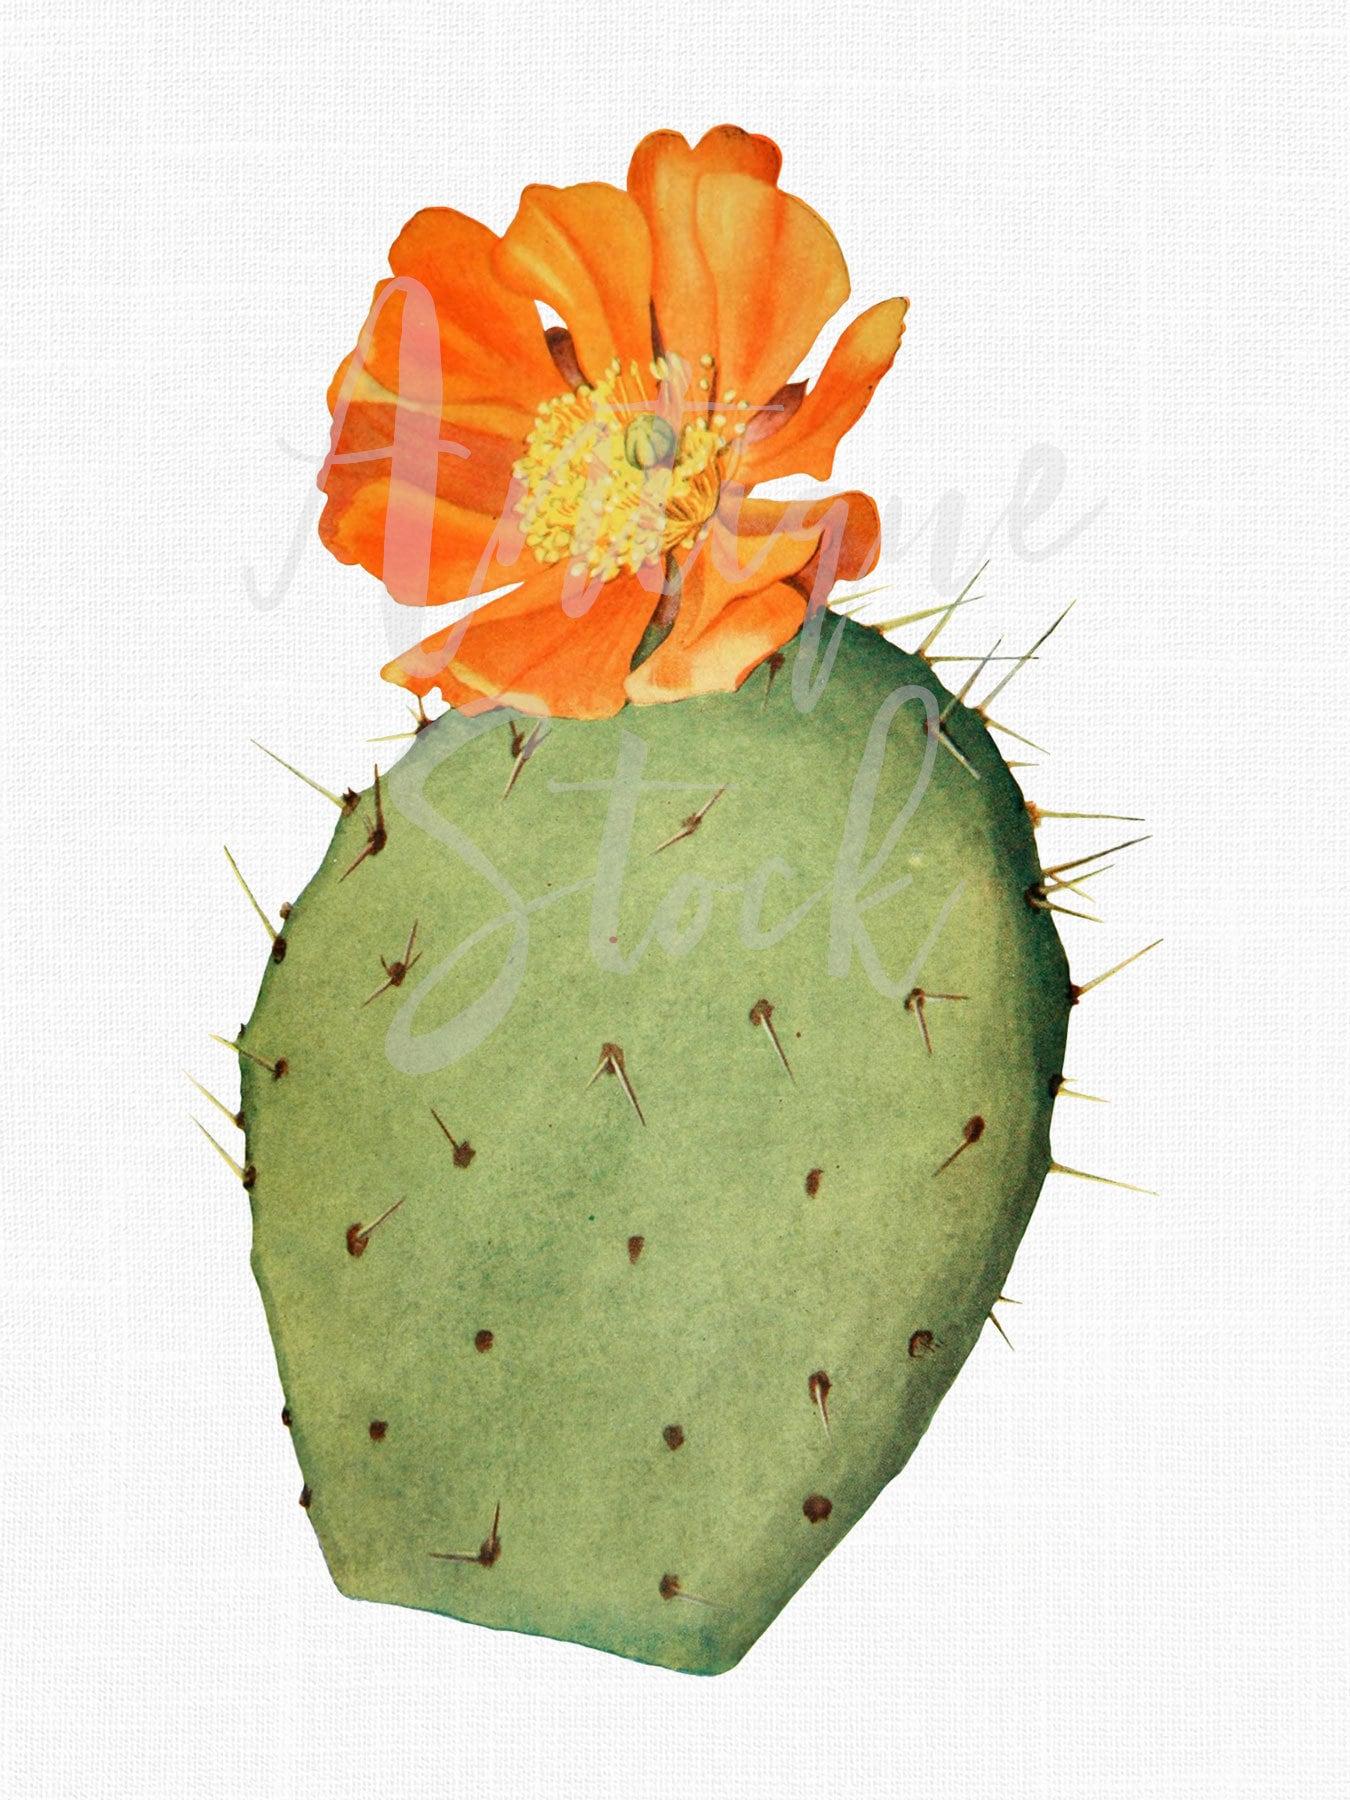 Cactus Clip Art Nopal De Cerro Old Printable Etsy Botanical Tree Ring Diagram Vintageprintable Zoom